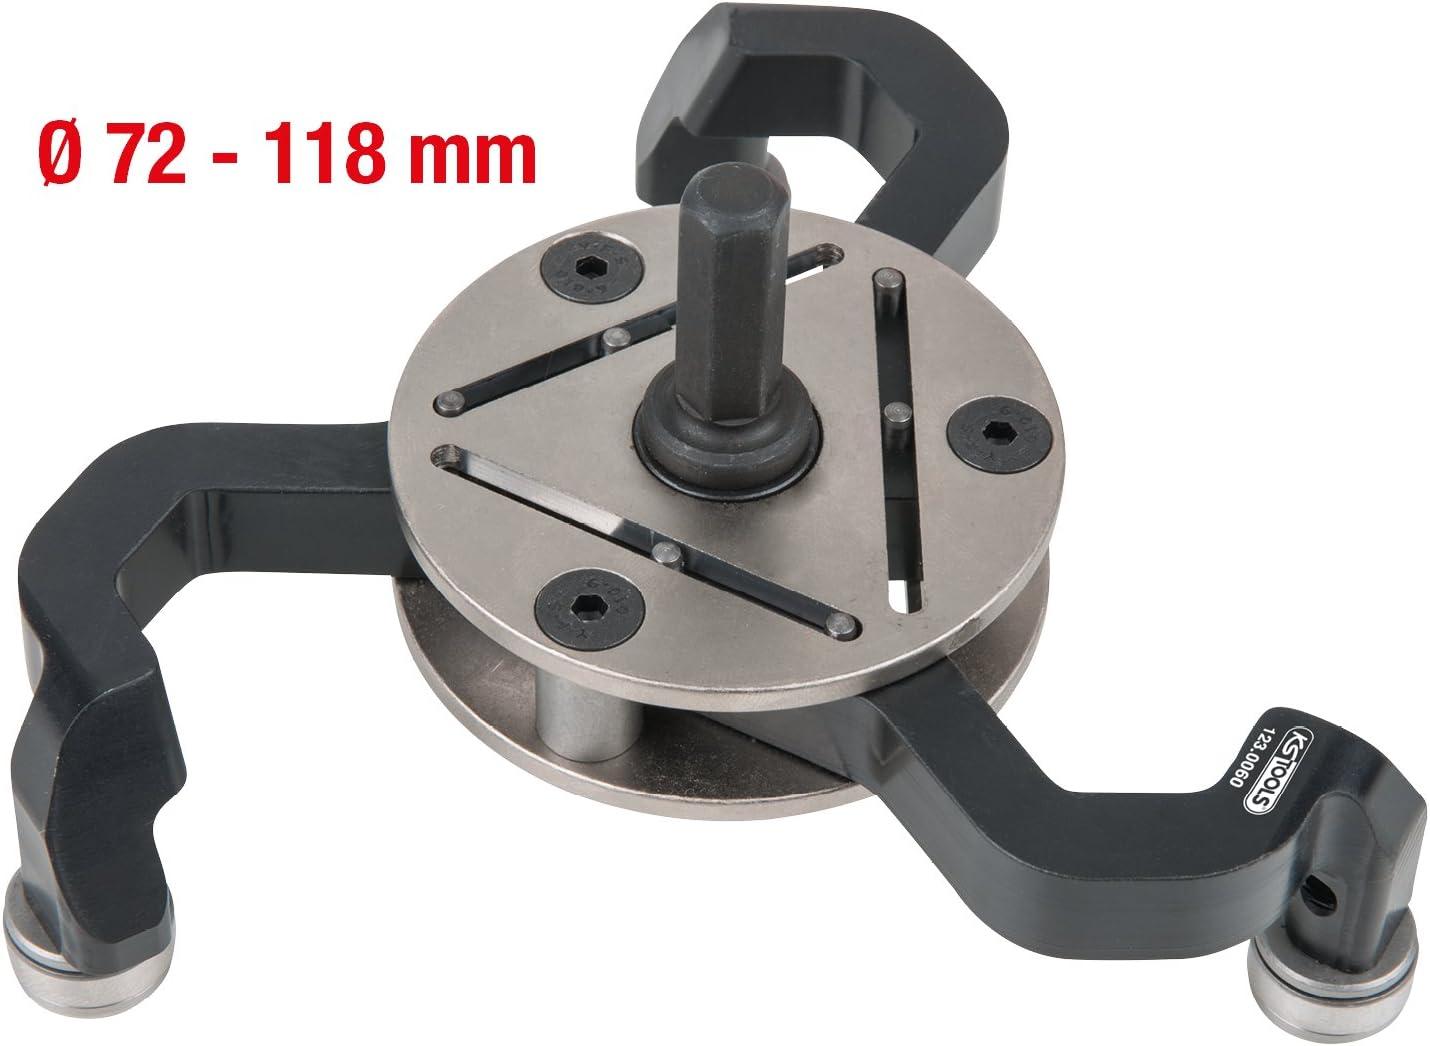 1/pezzi 123.0060 /118/mm KS-Tools selbsteinstellender tubo tgrater diametro 72/